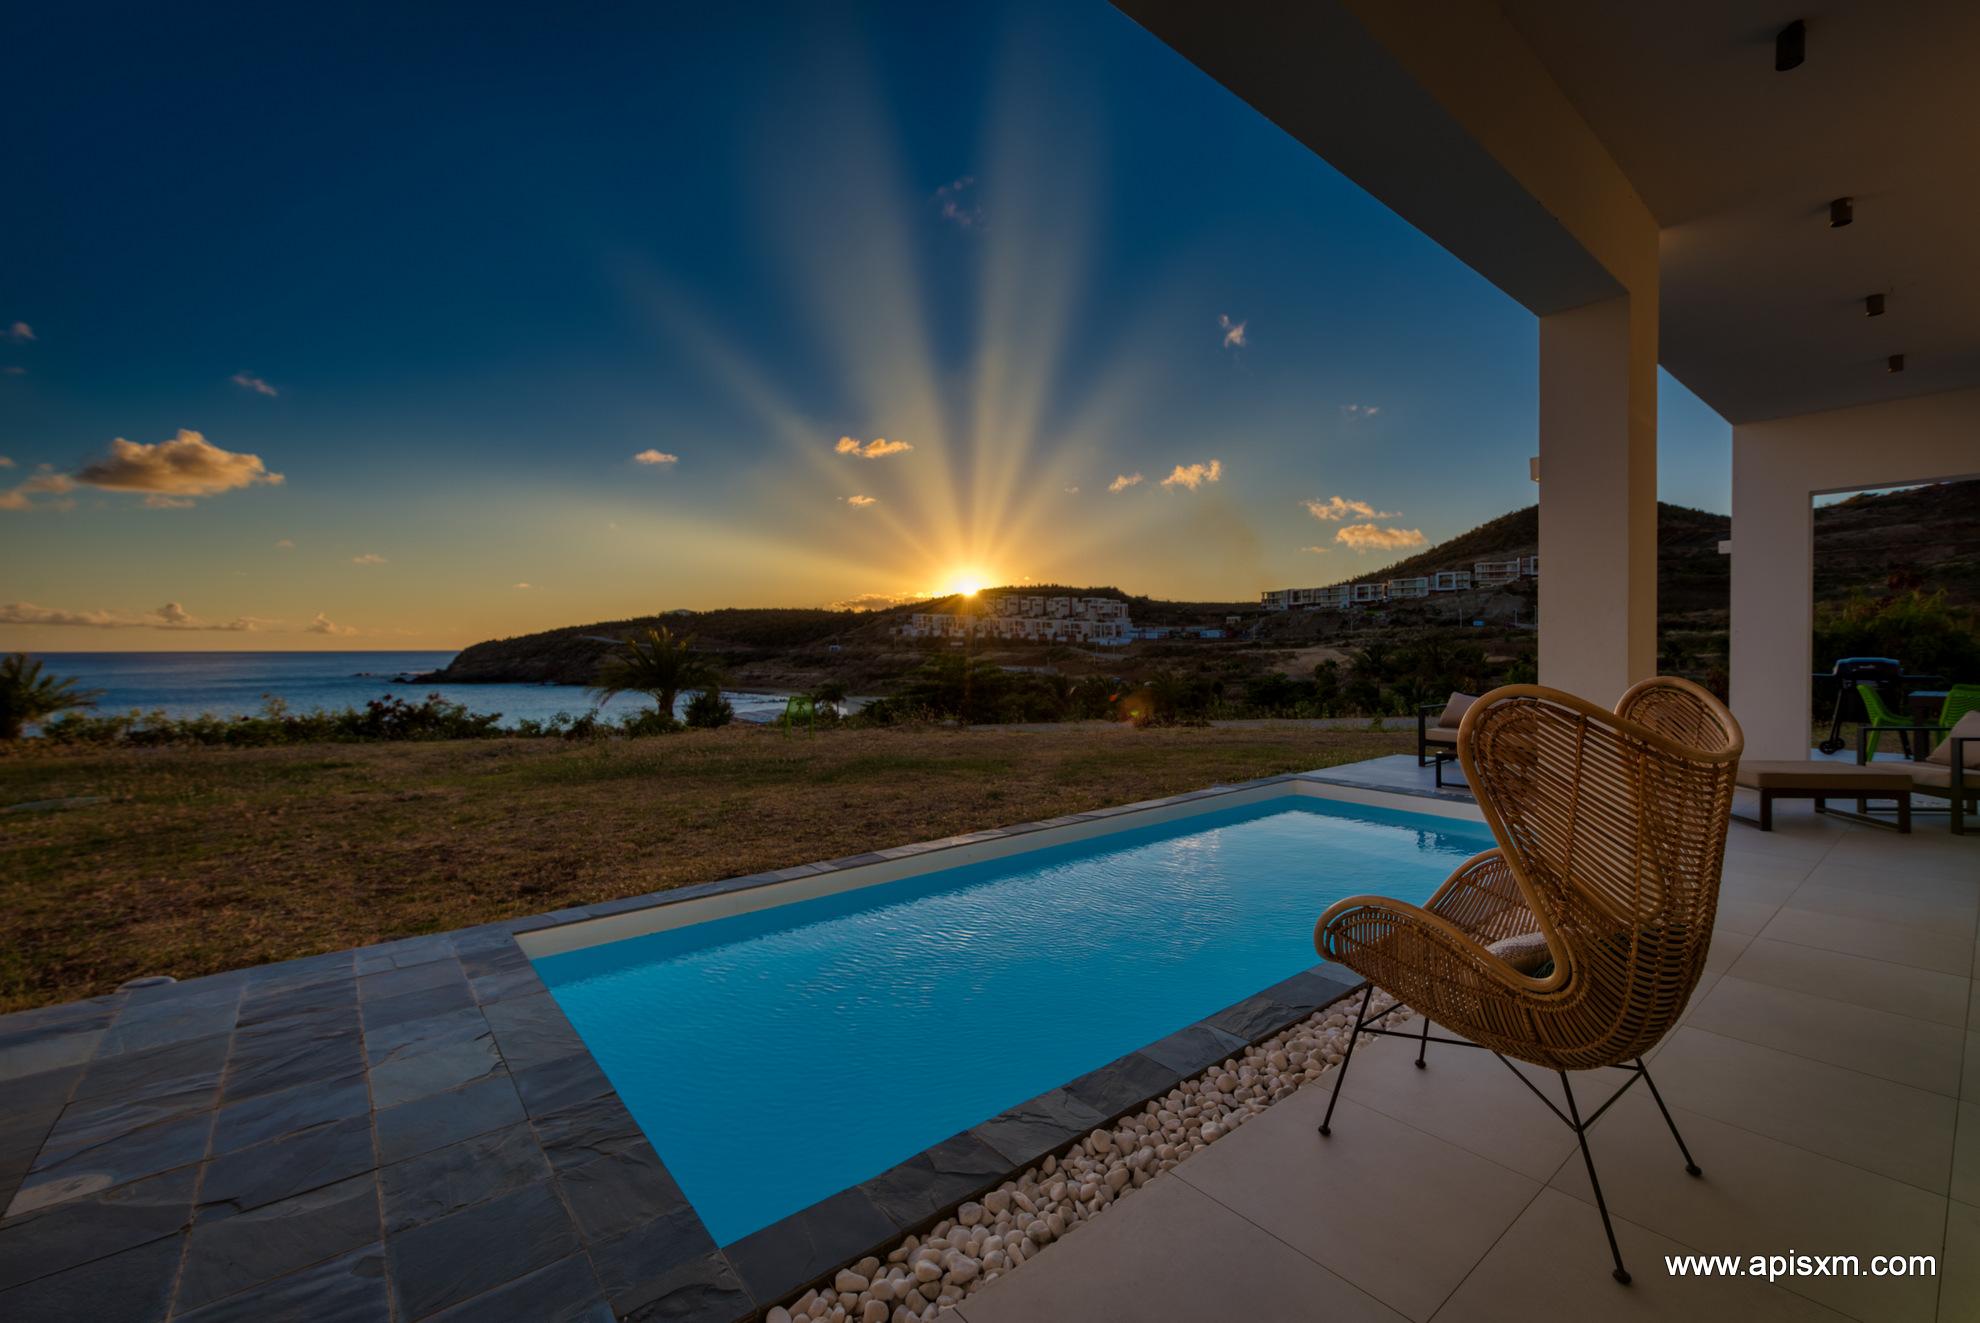 Luxueuse Villa Winter Sea à Indigo Bay Sxm